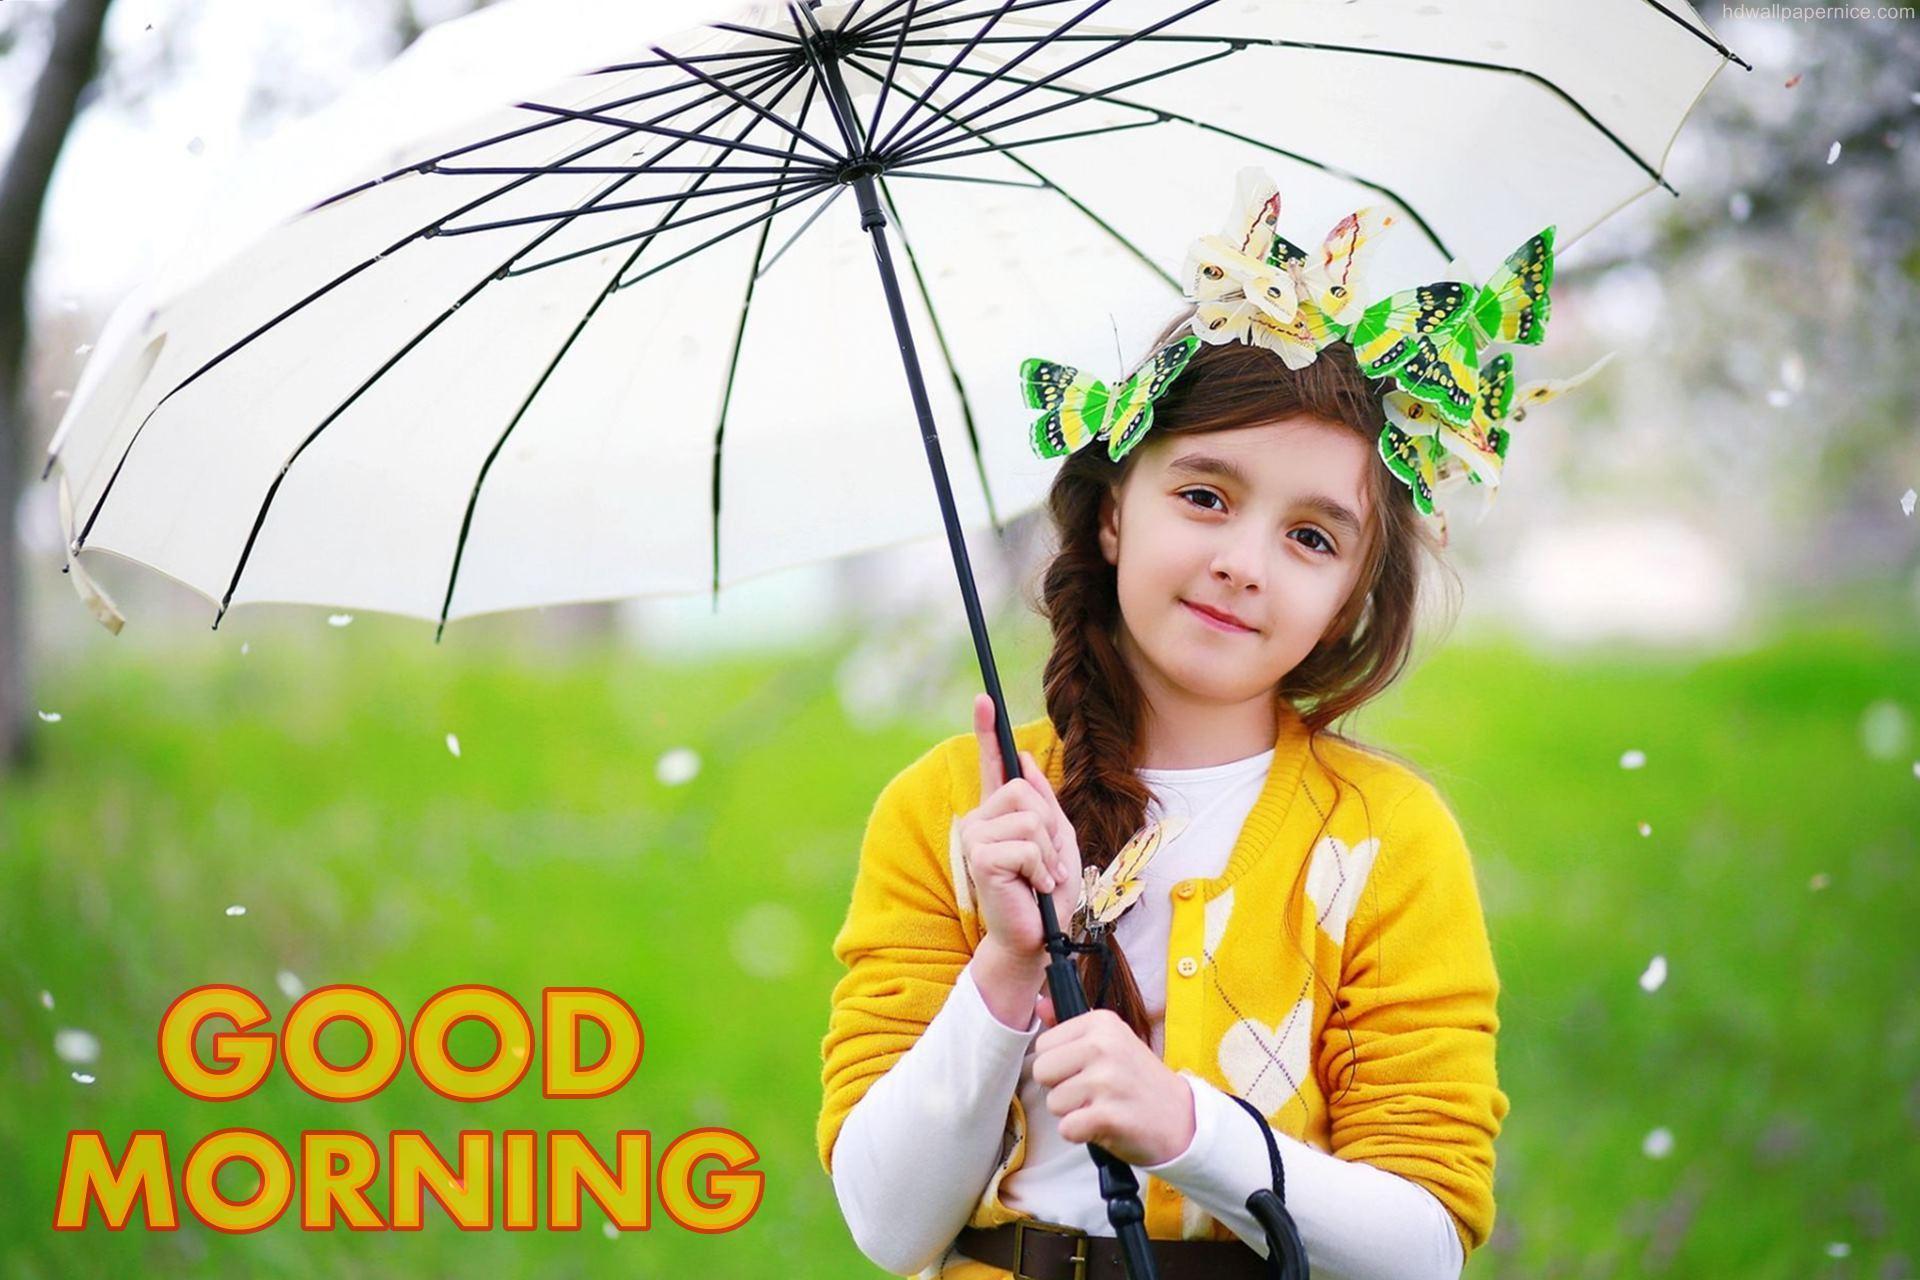 Beautiful Girl Wishing Good Morning